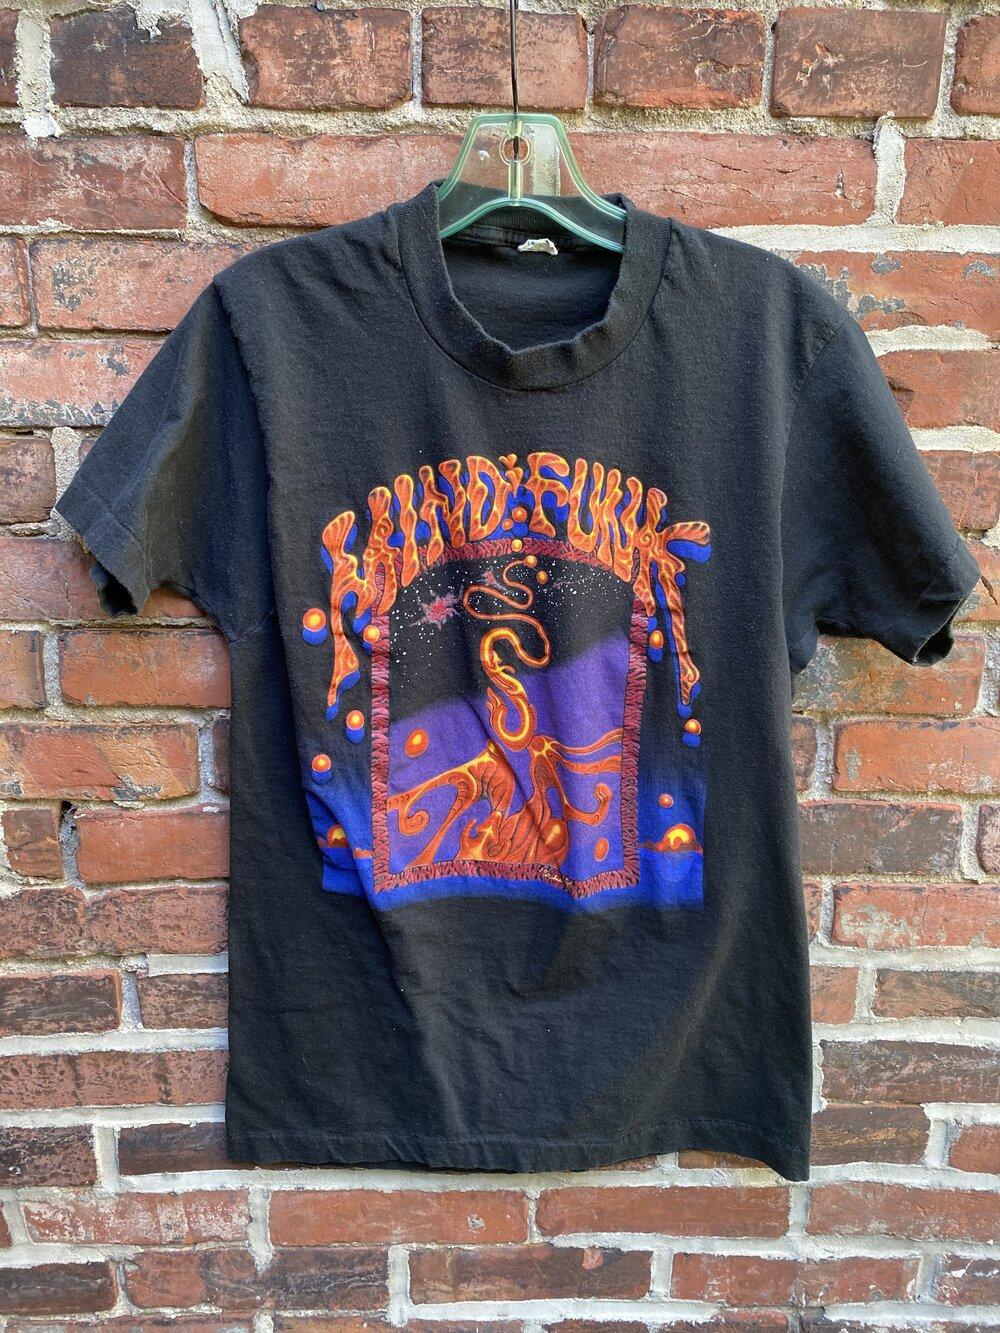 Vintage 90\u2019s Suede psycho album tshirt tee brit poo